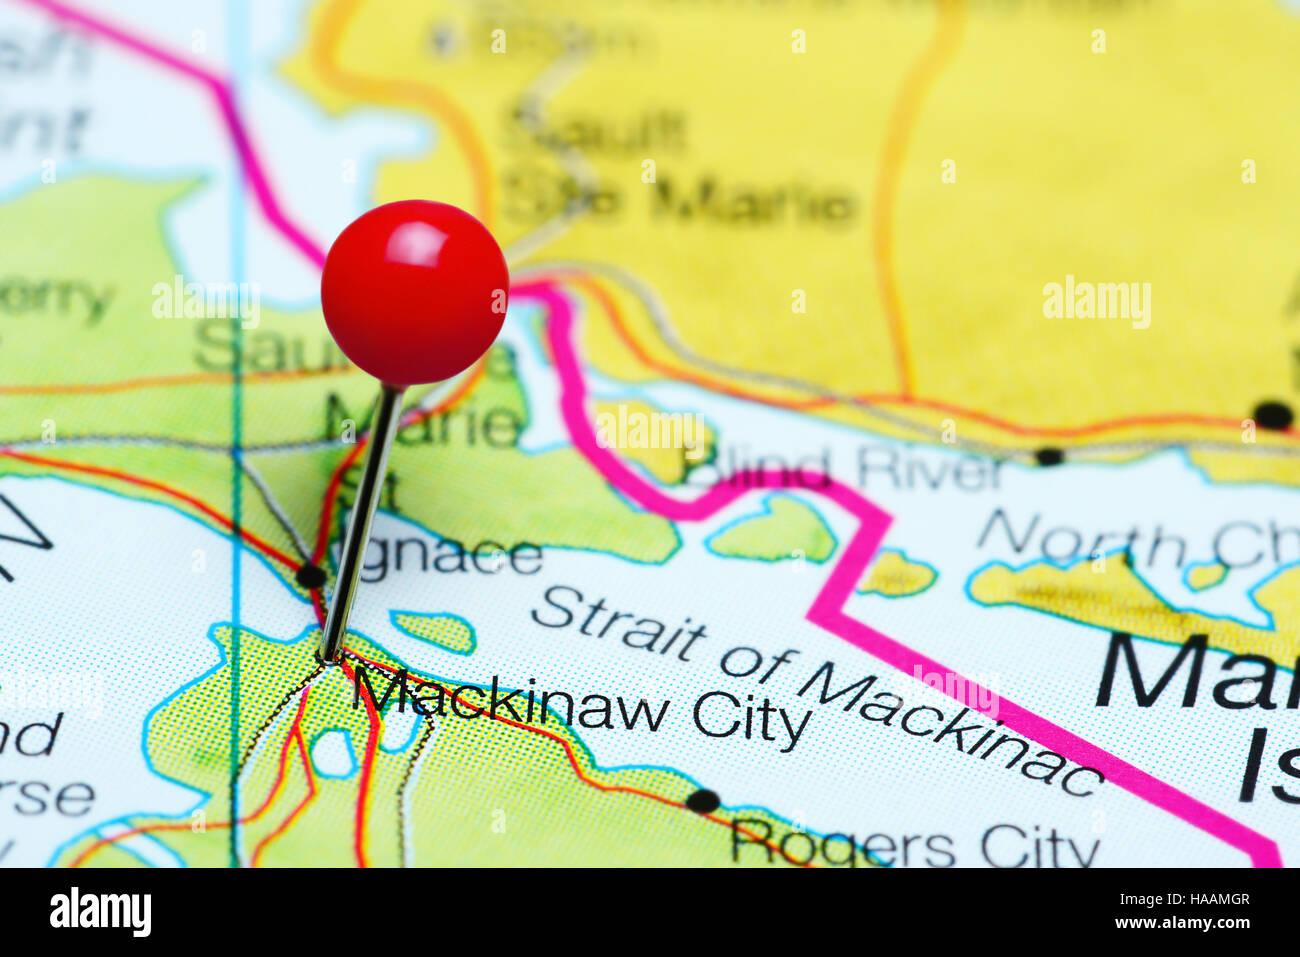 Mackinaw City pinned on a map of Michigan, USA Stock Photo ... on tawas map, united states map, st. ignace map, ironwood map, kalkaska map, cheboygan map, sault ste. marie map, petoskey state park map, gaylord map, dearborn map, holt mi map, port of indiana map, city of petoskey street map, canon city riverwalk trail map, mackinac island map, mackinac county map, michigan map, superior map, peninsula township map, ypsilanti map,